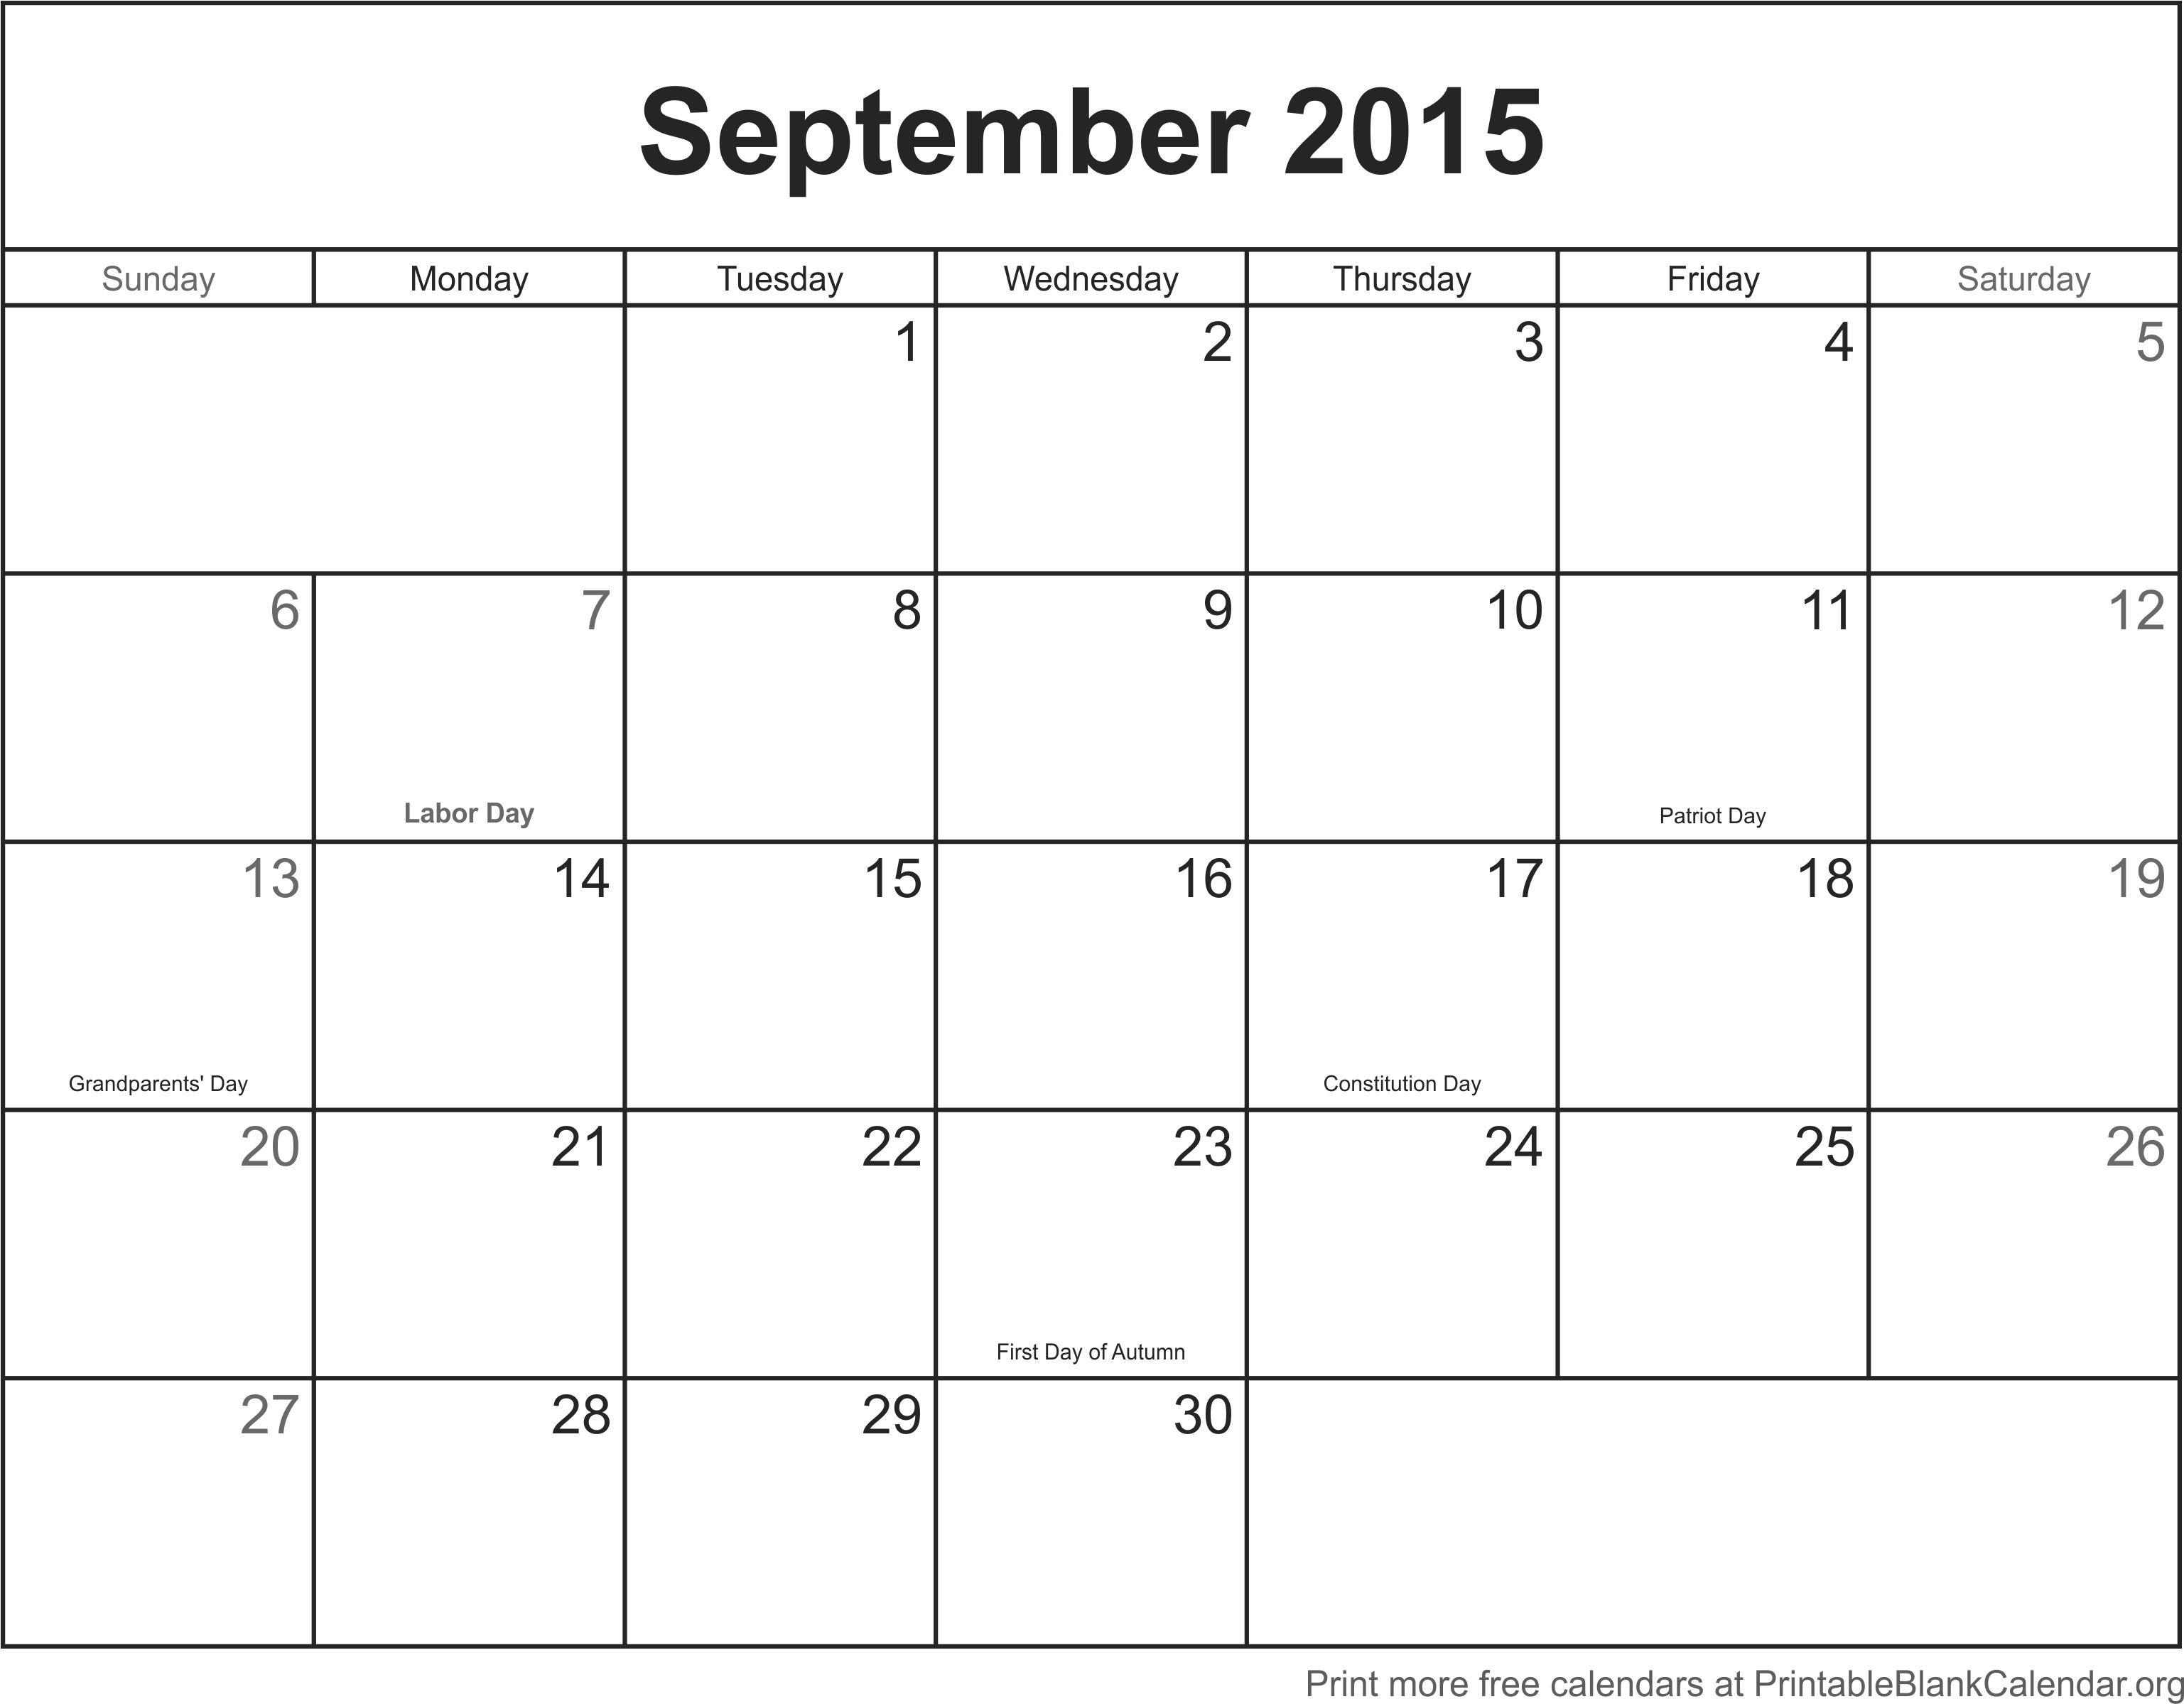 002 September Printable Calendar Template Ideas Rare Blank 2016 with regard to September Printable Monthly Calendars Blank